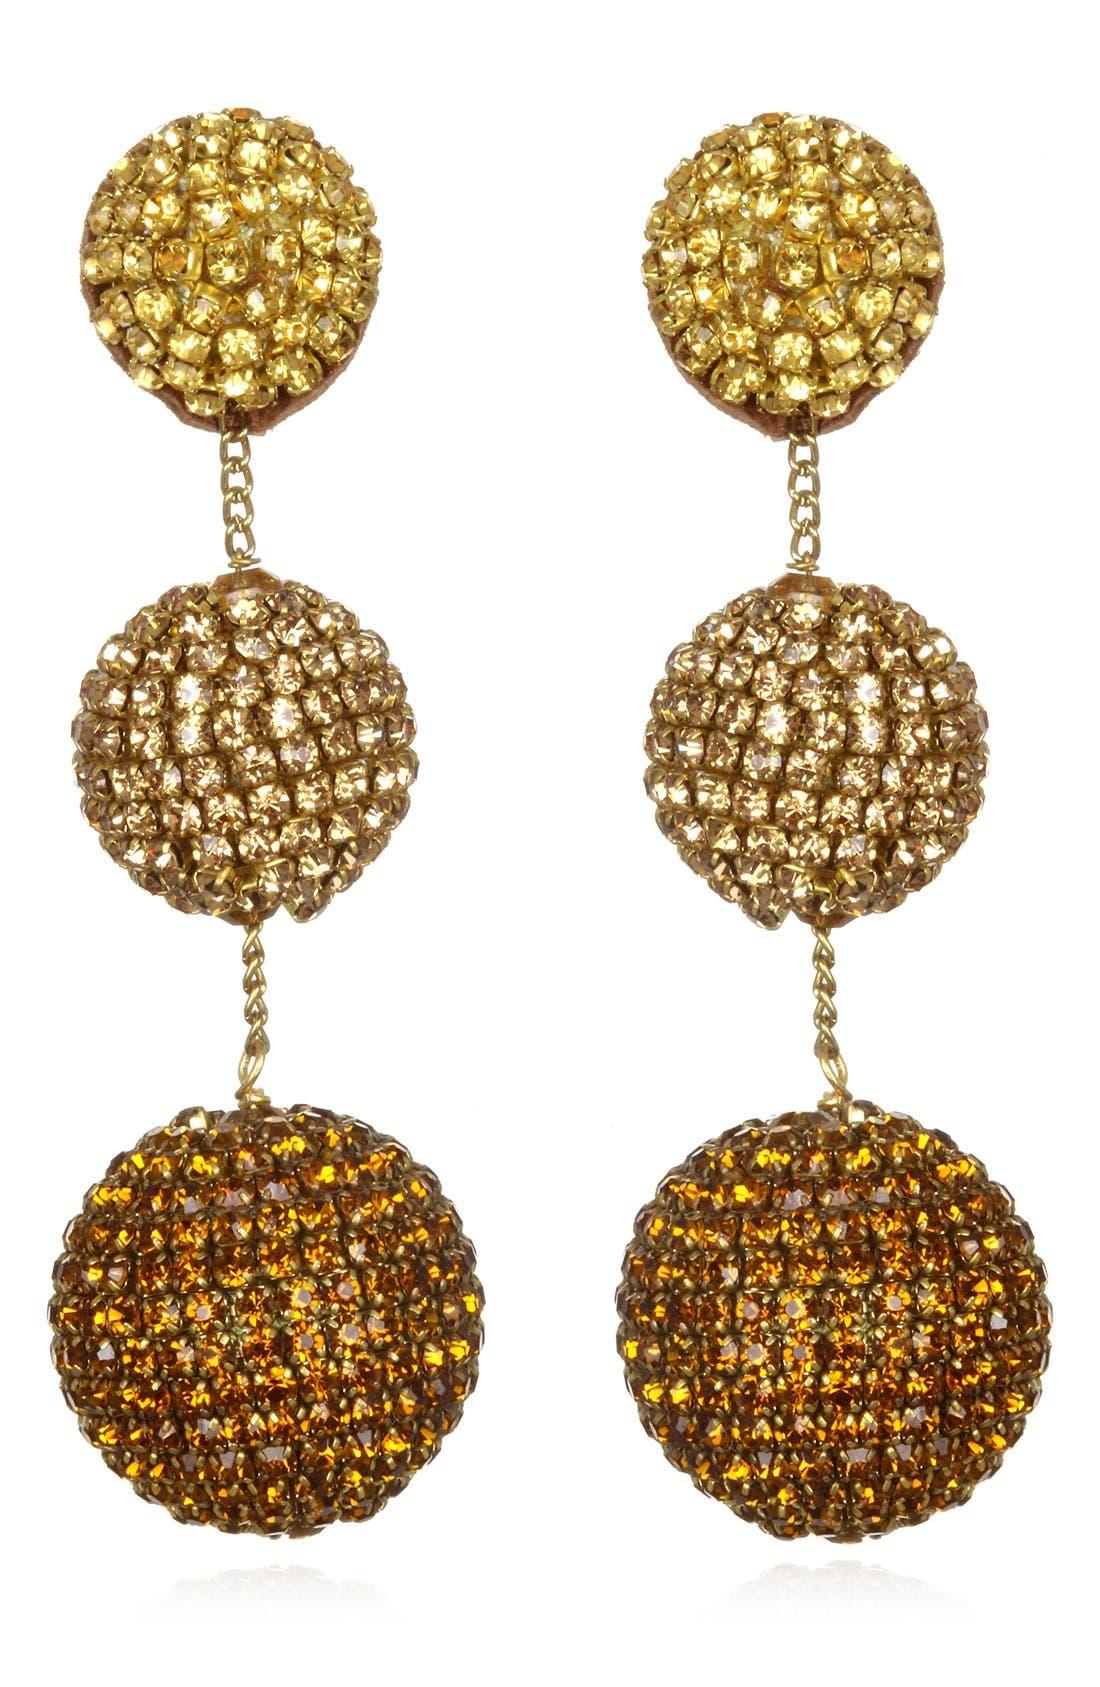 Alternate Image 1 Selected - Suzanna Dai Rhinestone Gumball Drop Earrings